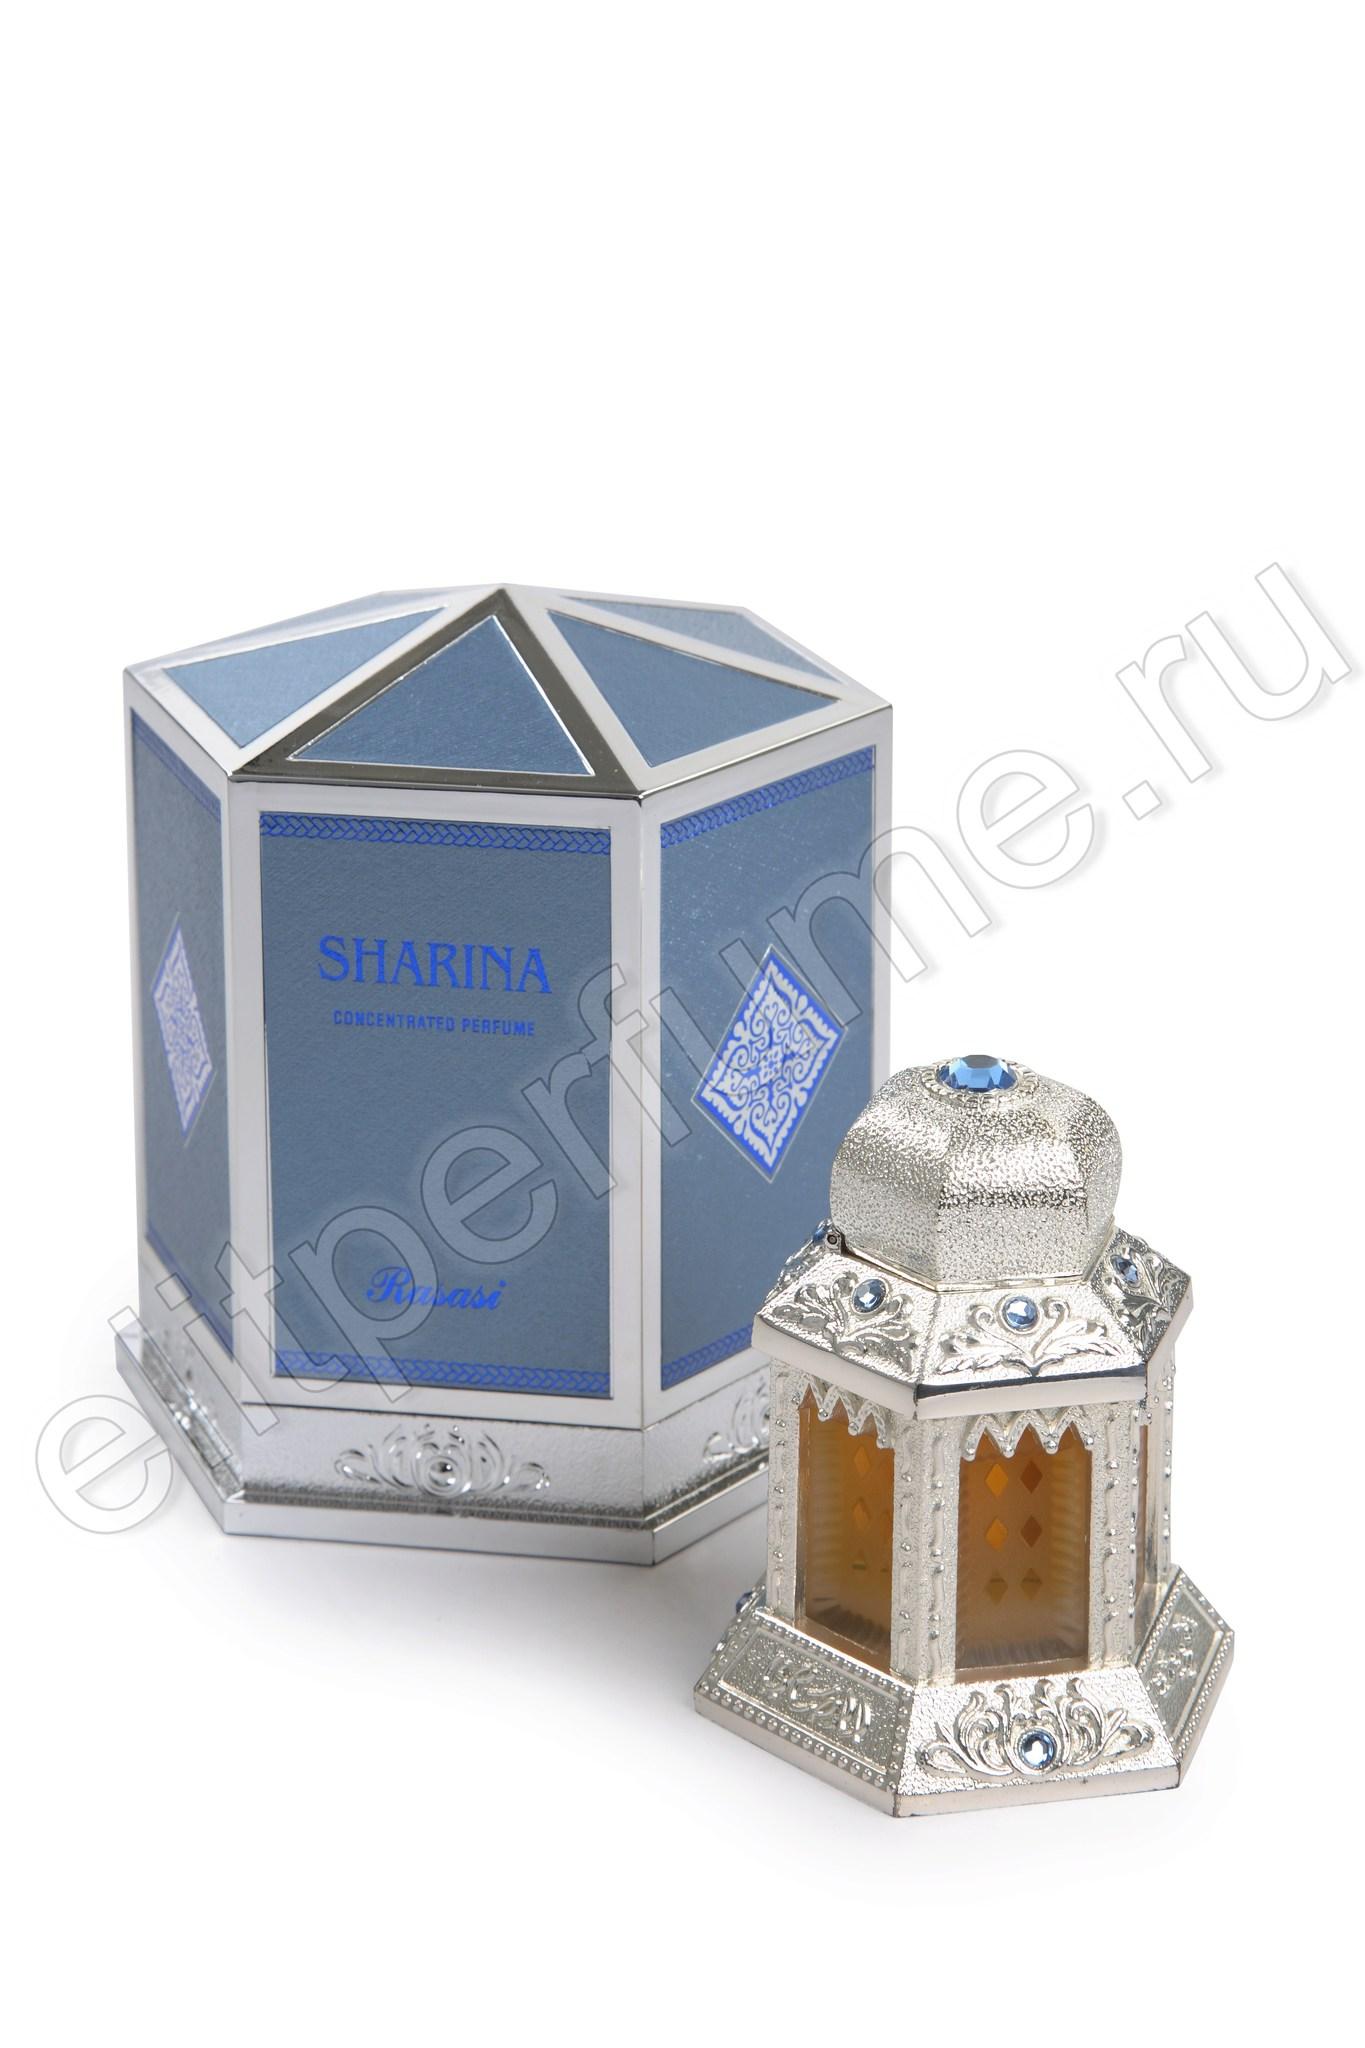 Пробники для духов Шарина Мухаллат Денал Уд Sharina Mukhallat Dhanel Oudh 1 мл арабские масляные духи от Расаси Rasasi Perfumes